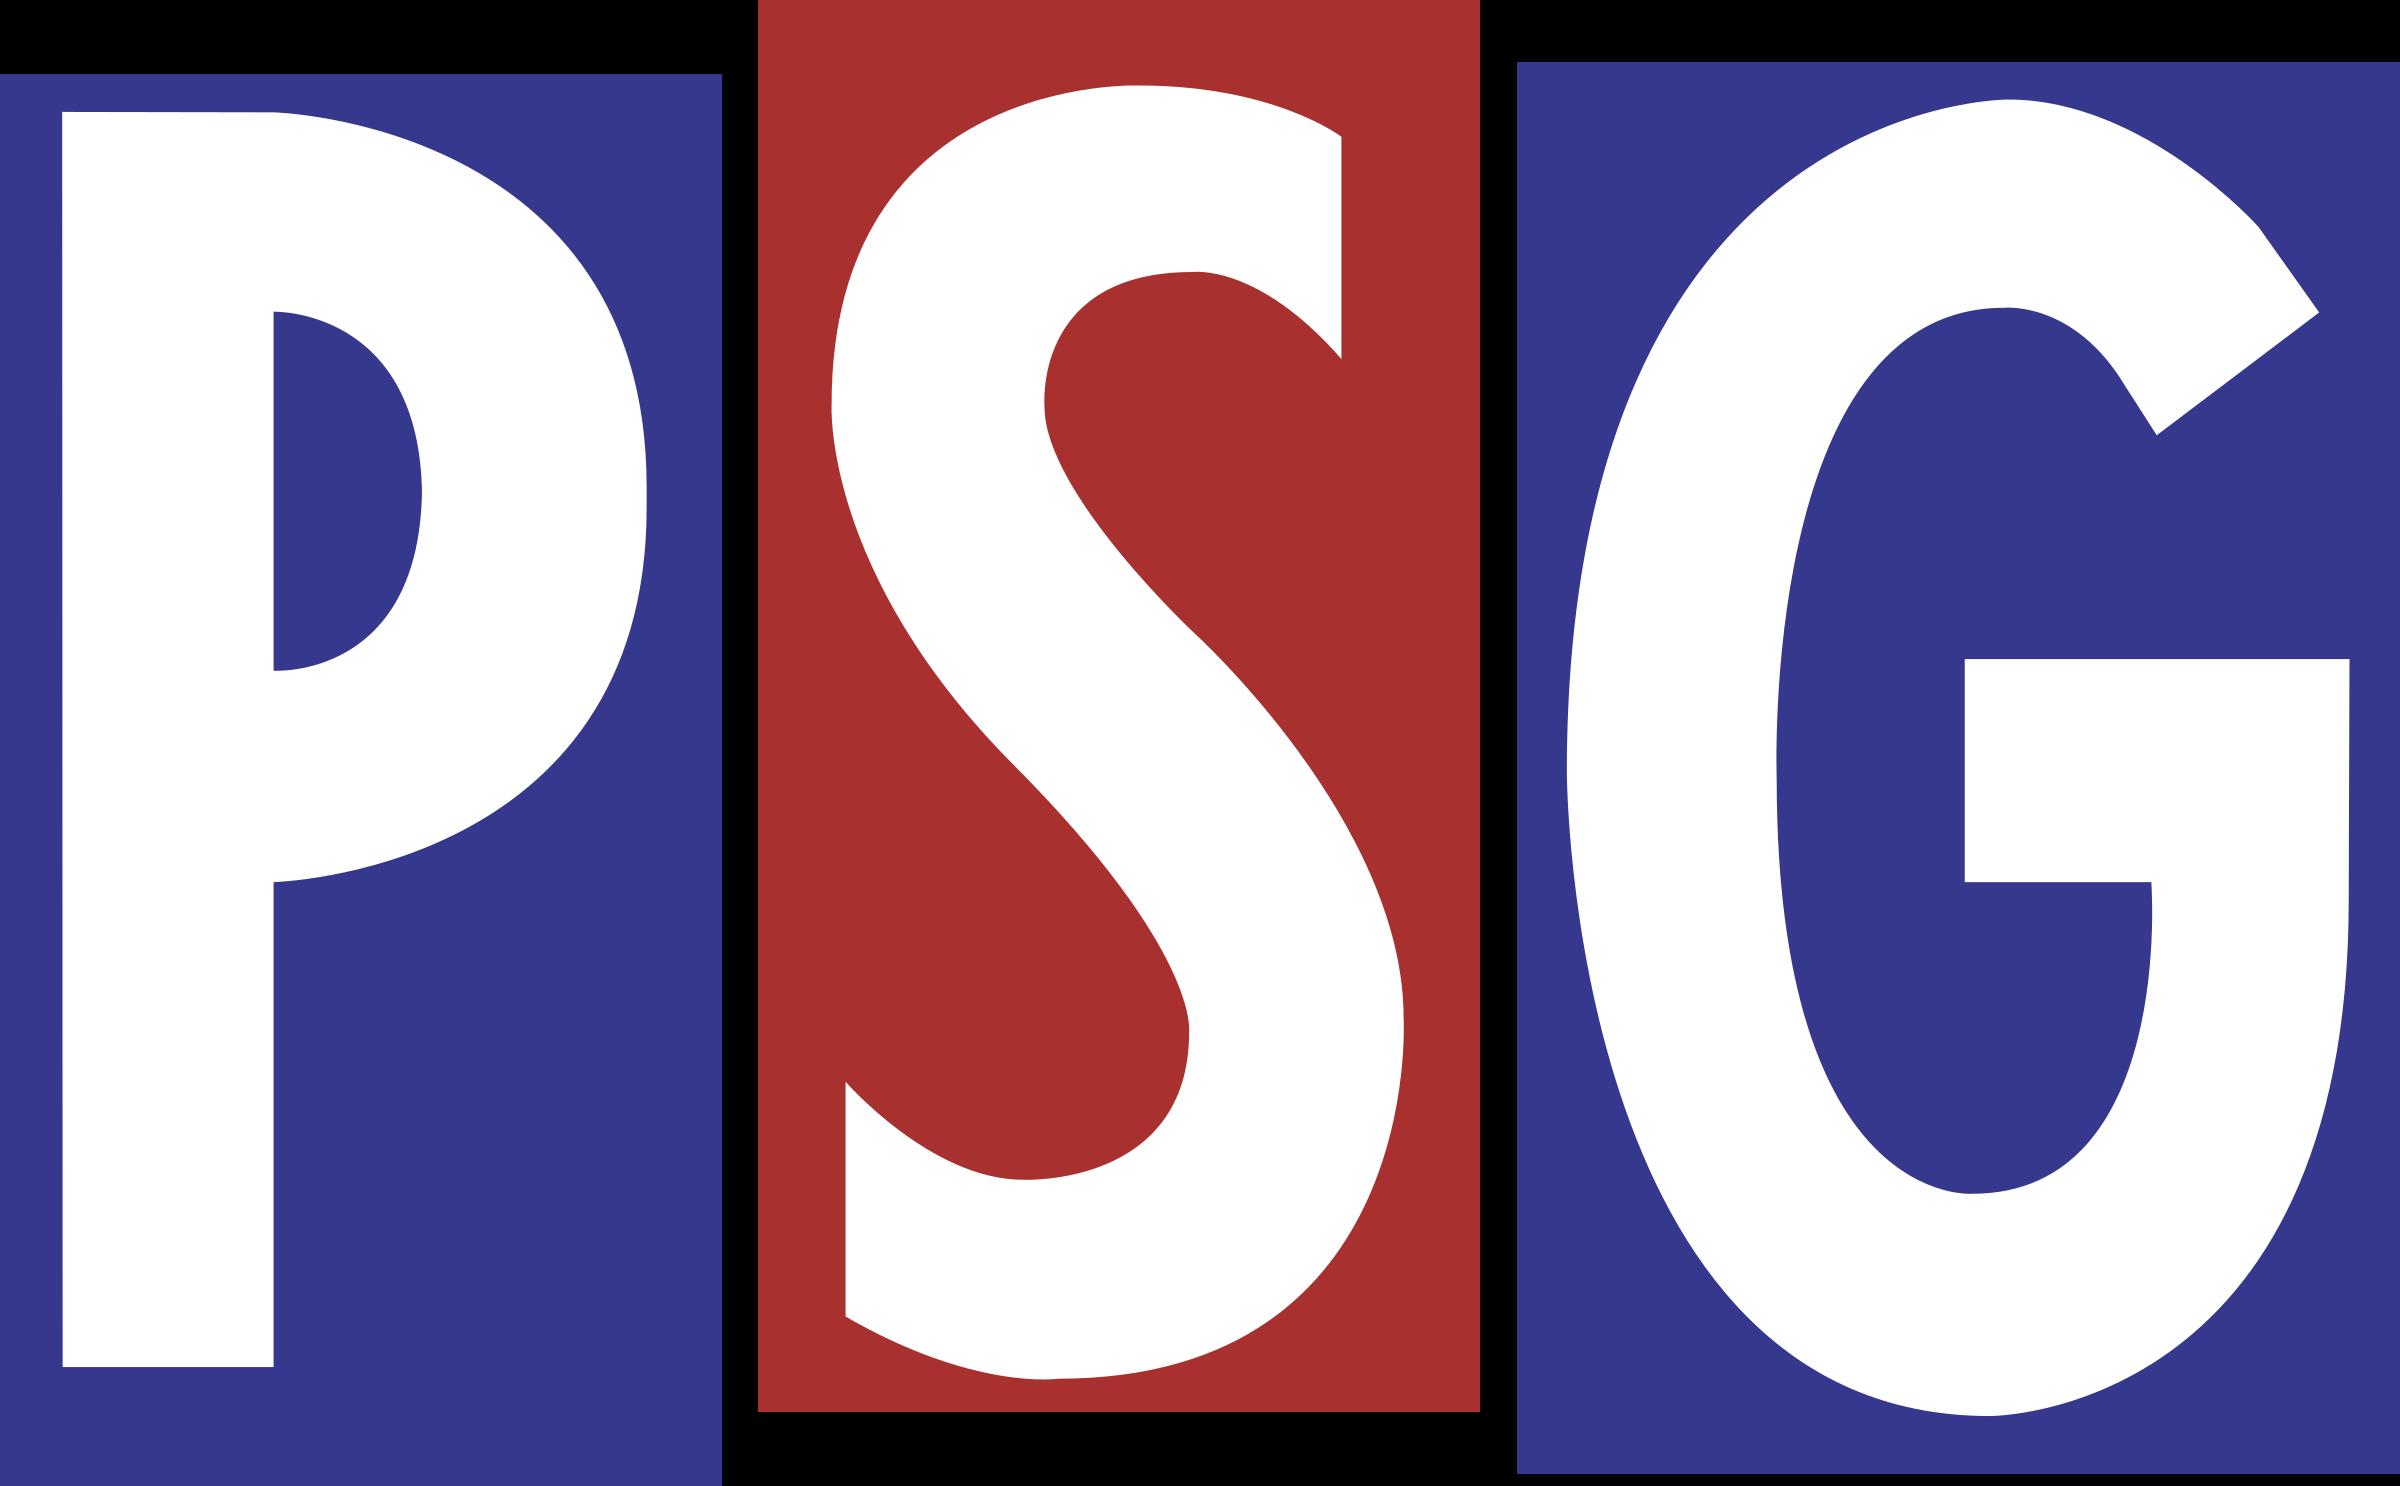 Psg Logo Transparent - Popular Century